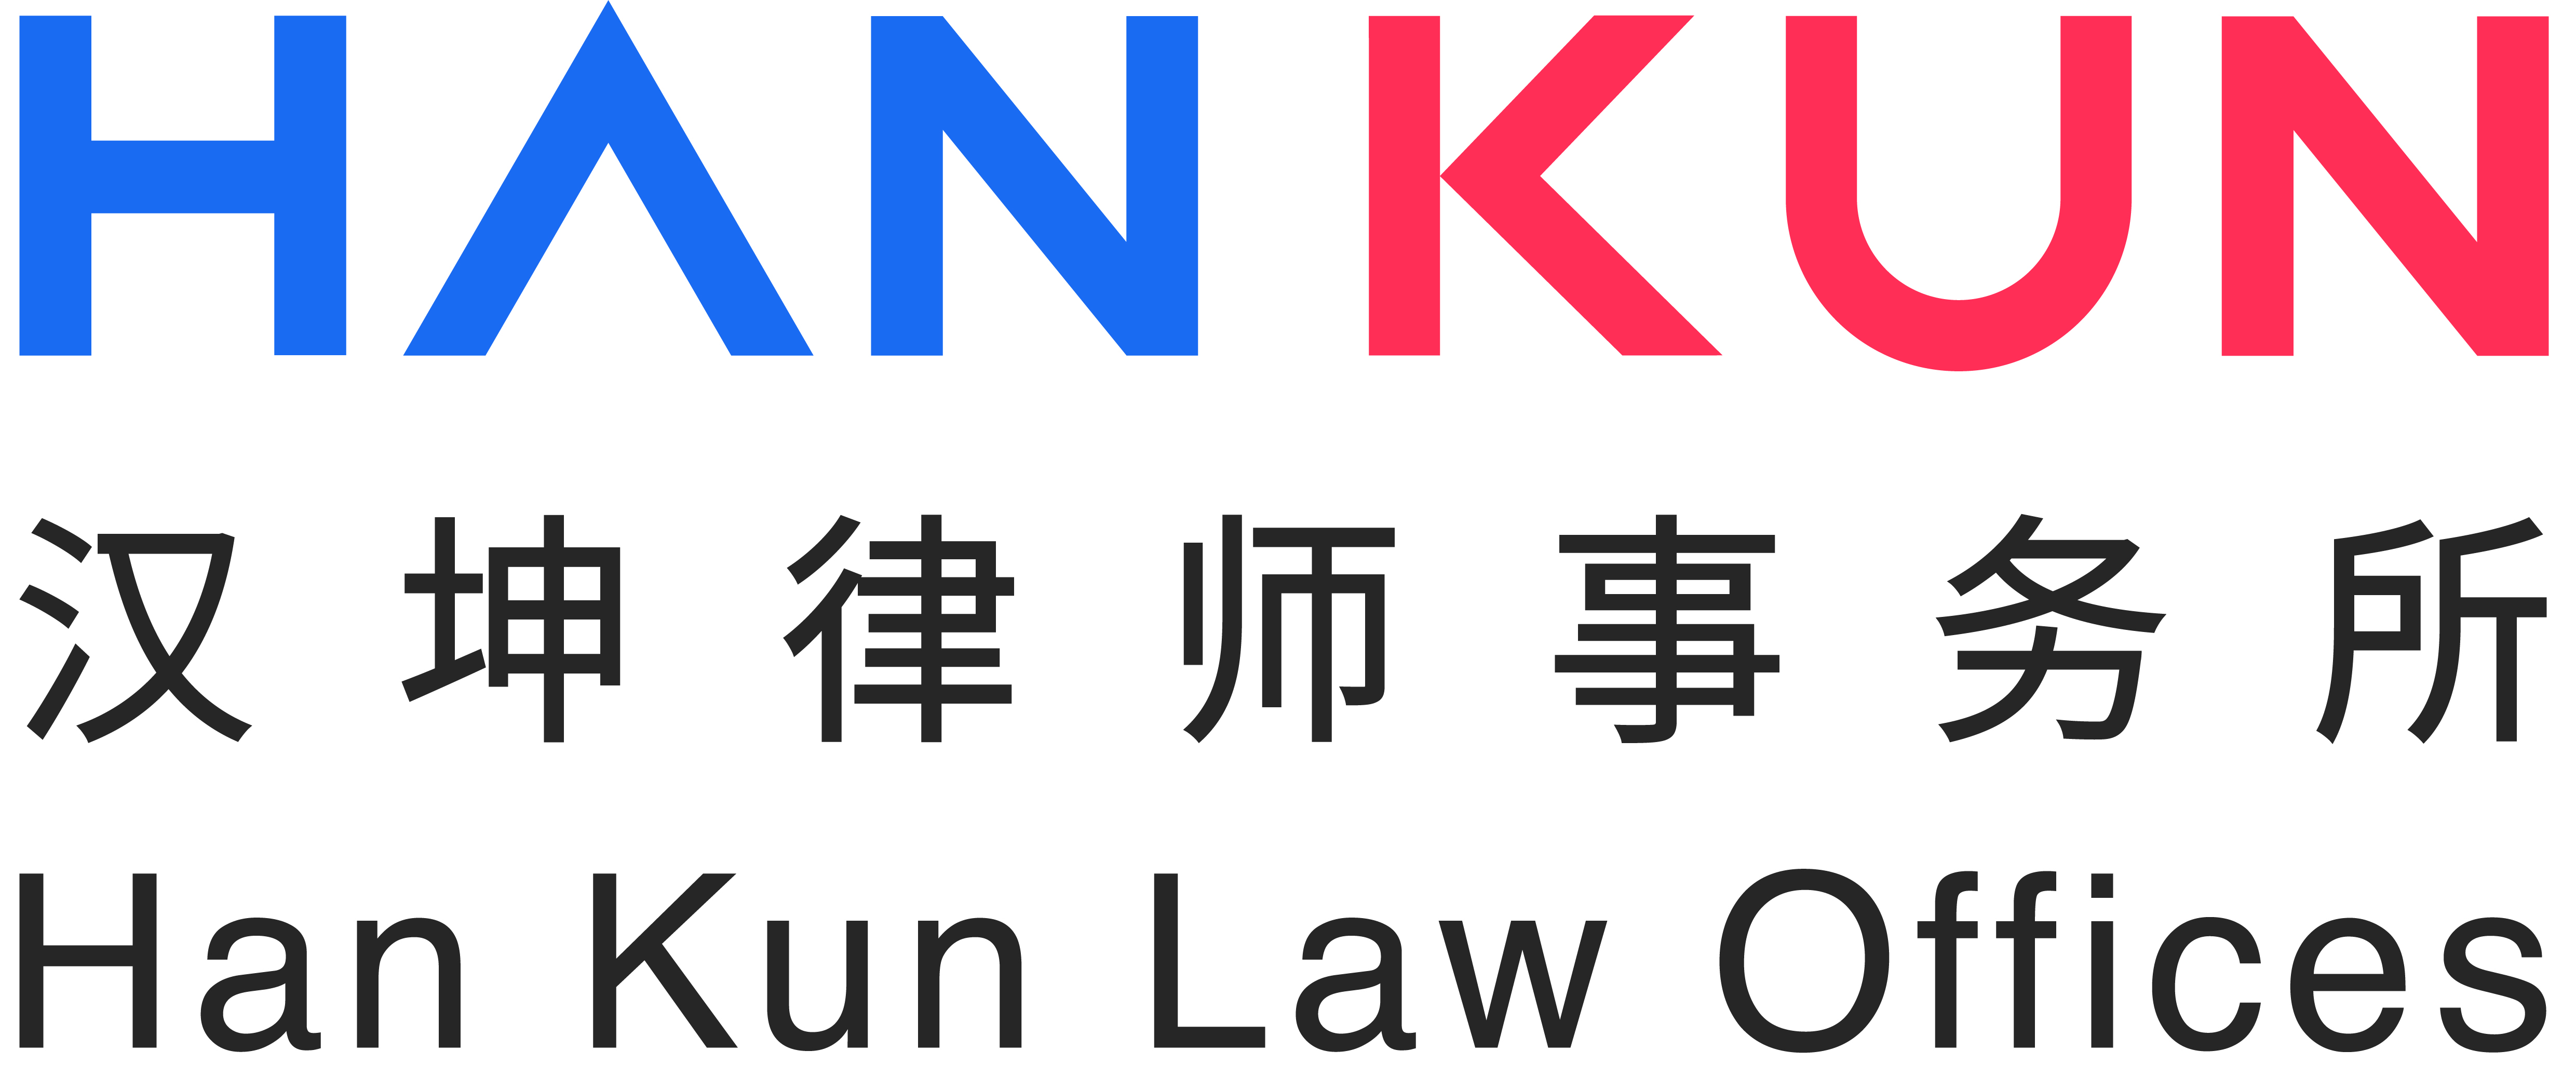 Han Kun Law Offices